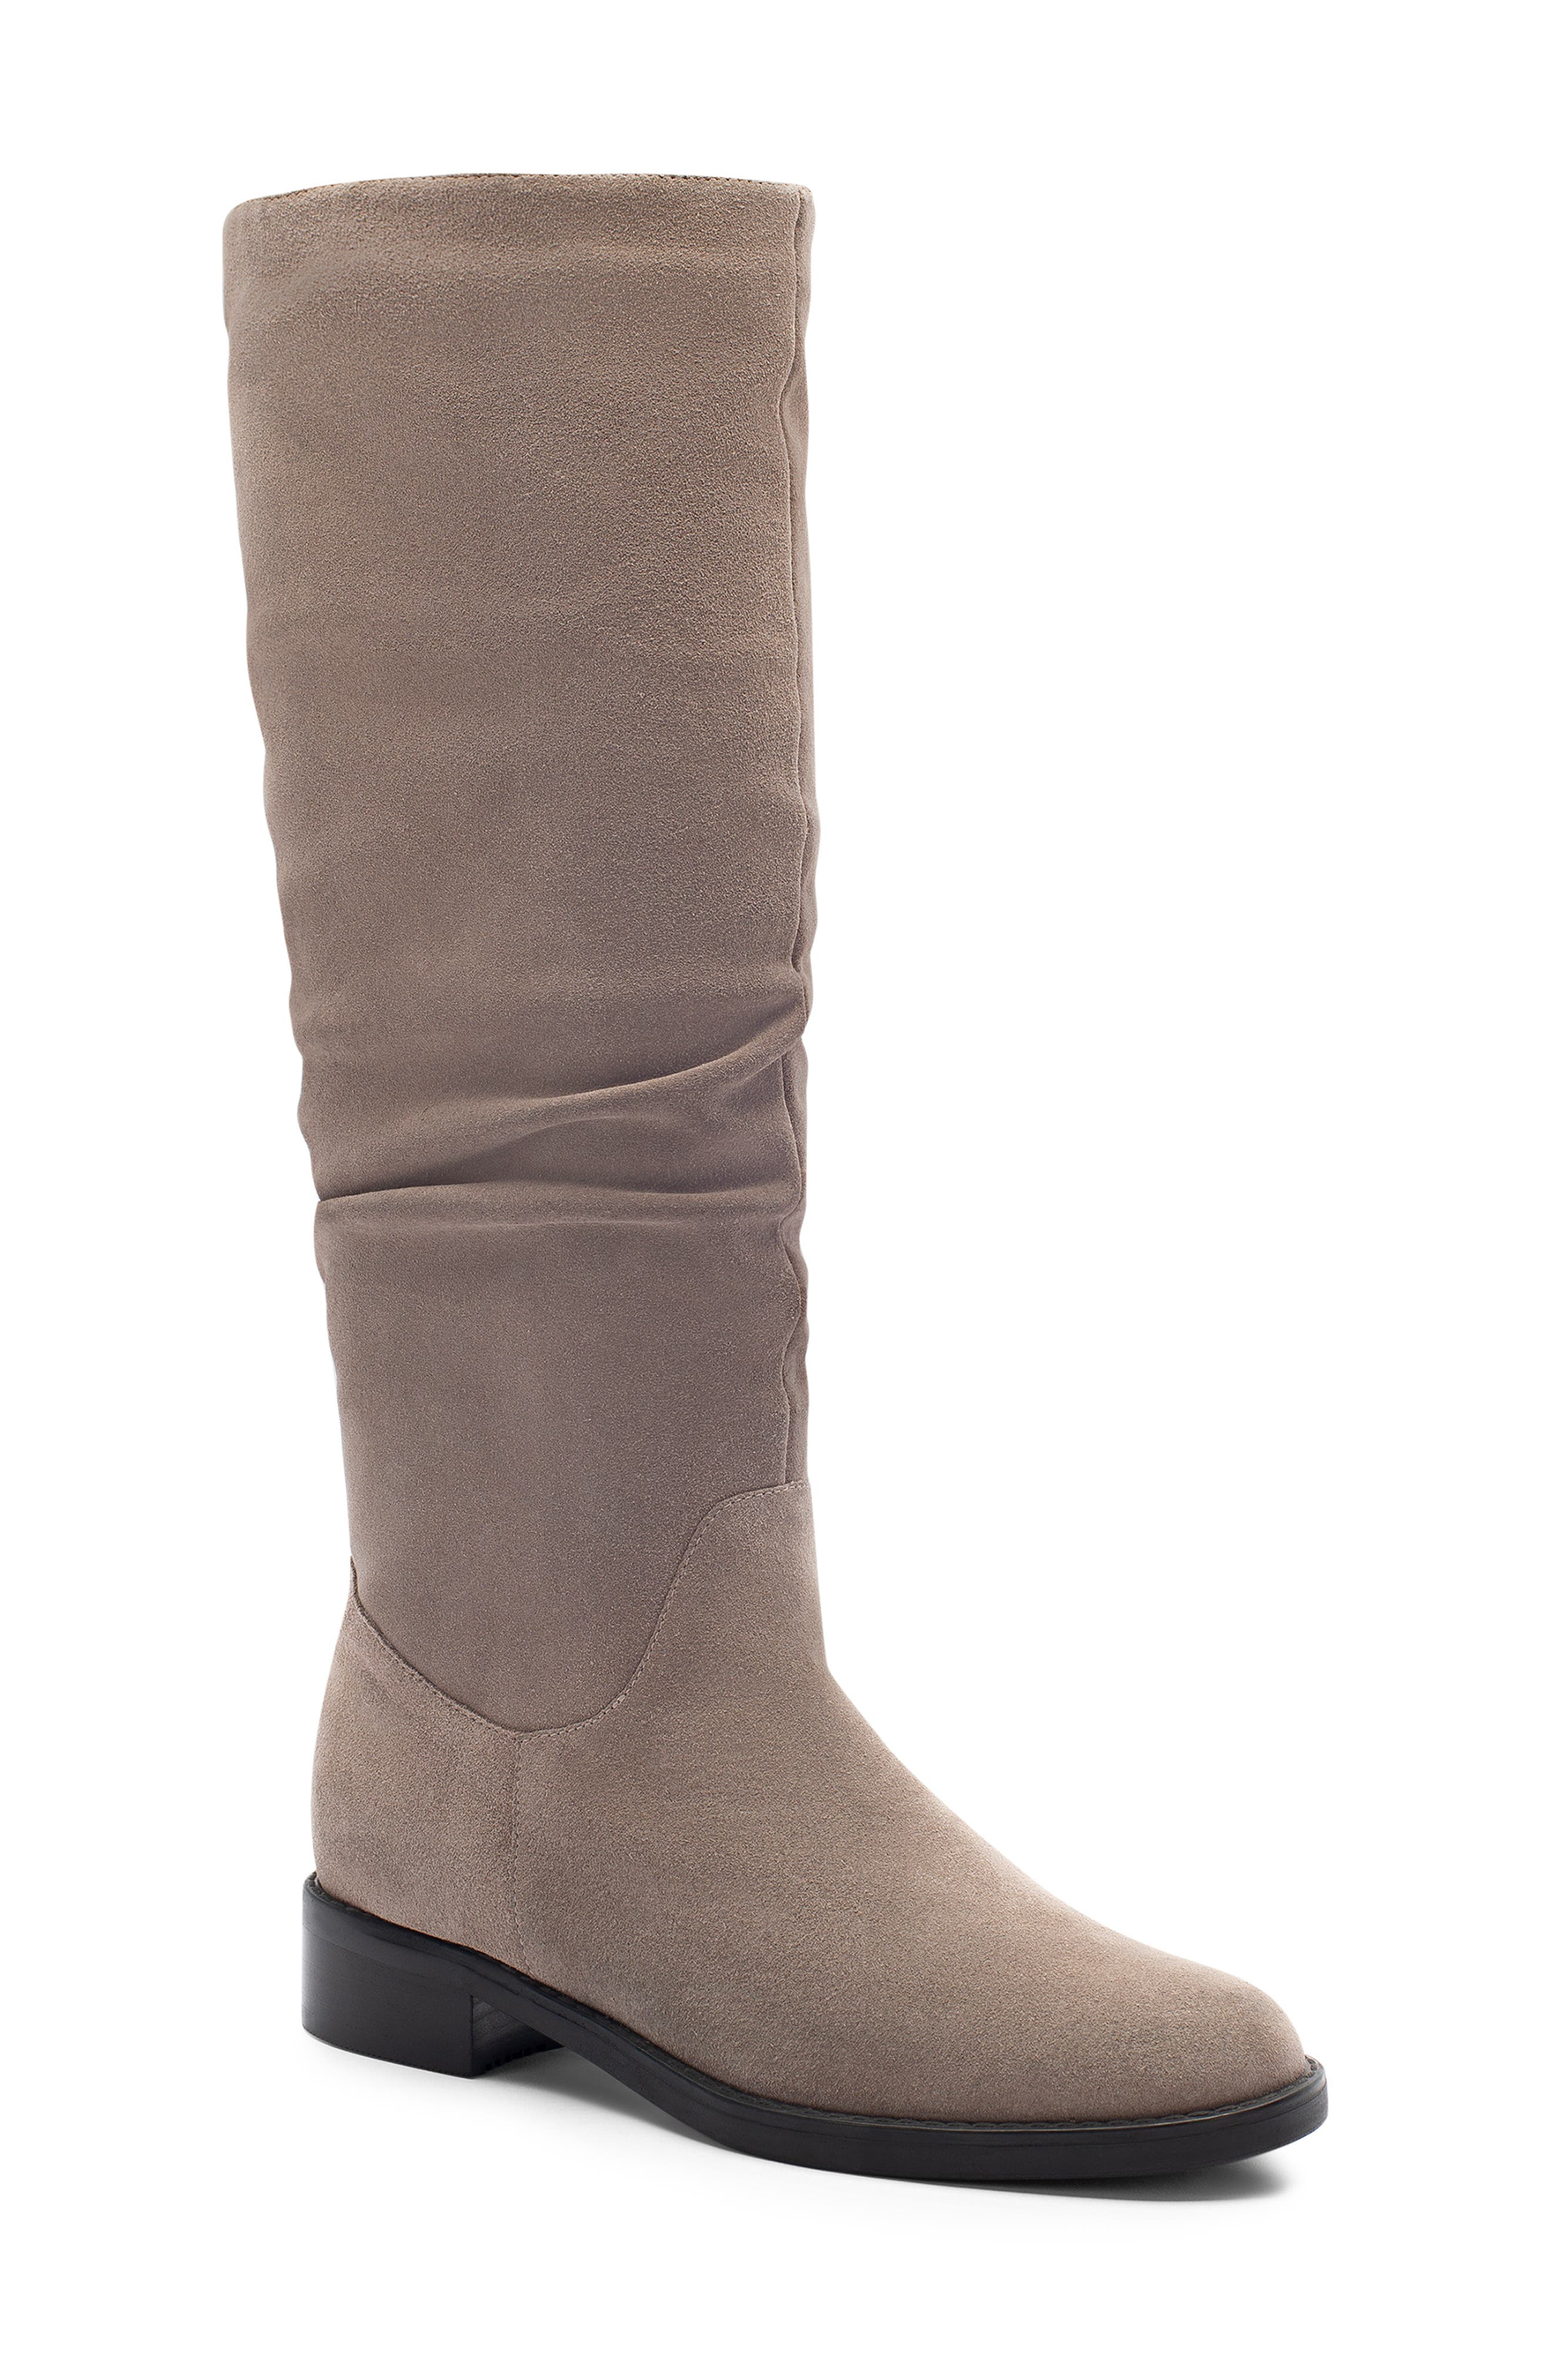 Erika Waterproof Knee High Boot,                             Main thumbnail 1, color,                             DARK TAUPE SUEDE